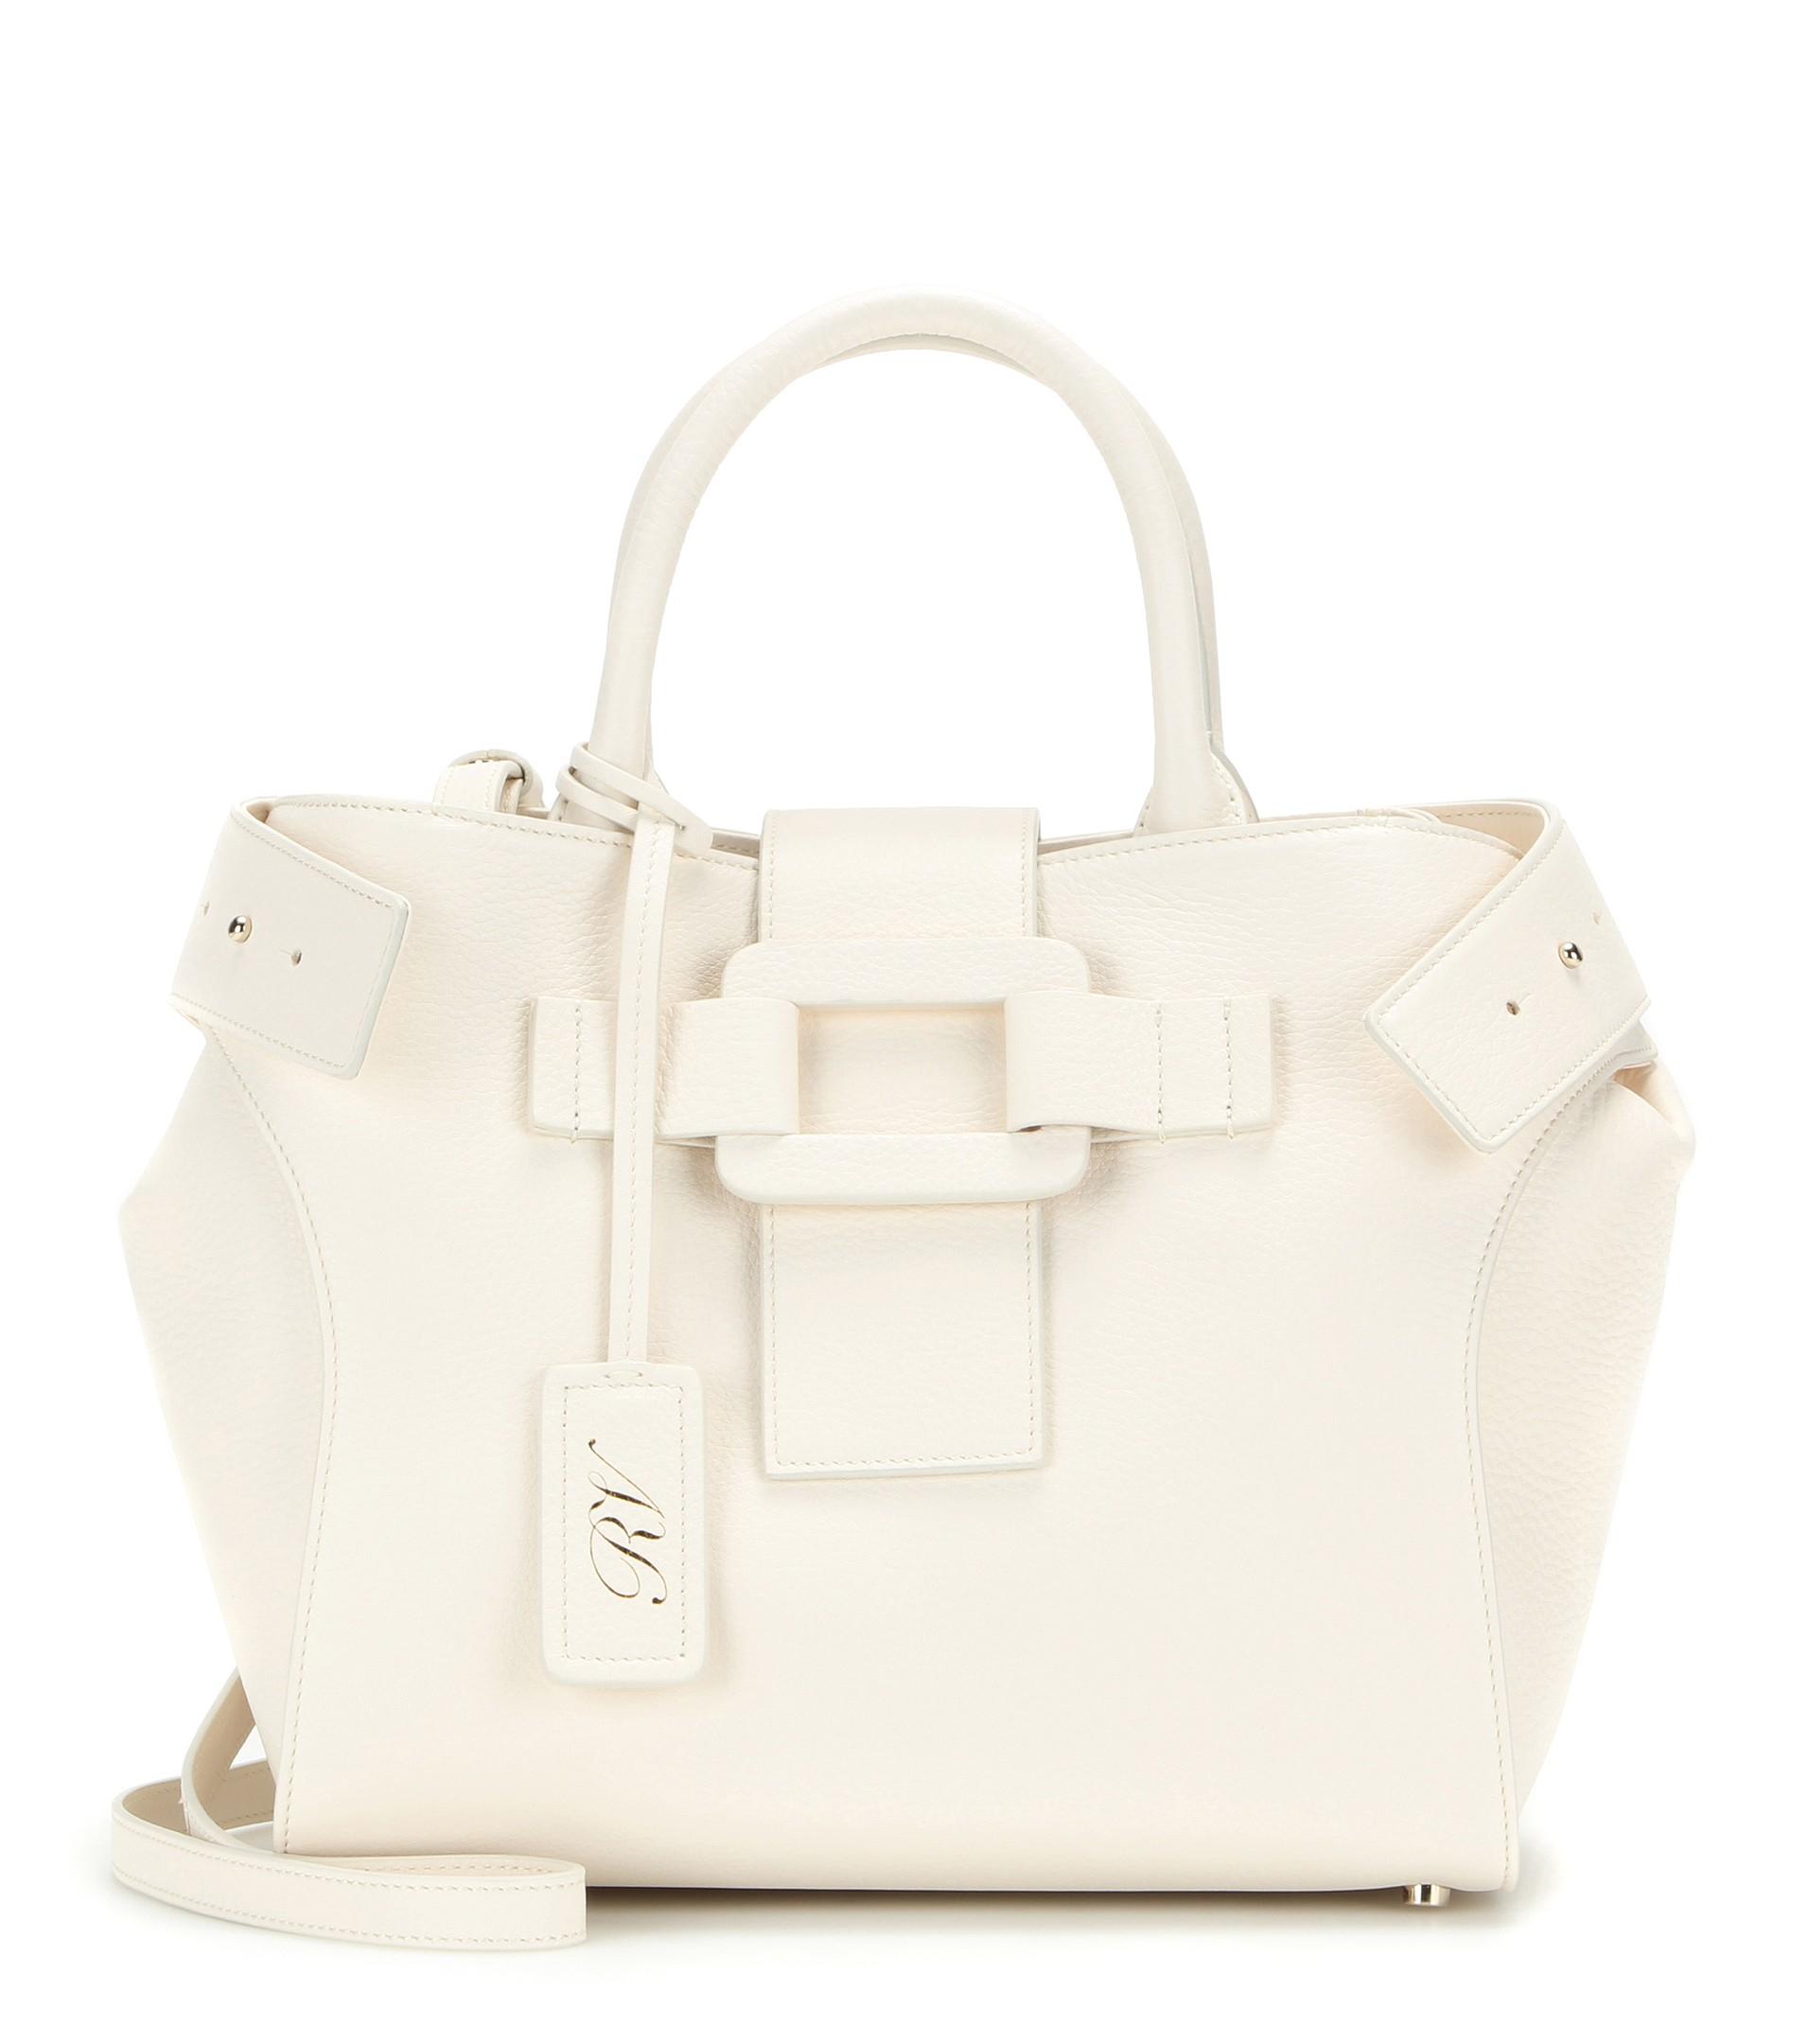 3e796d39ea Lyst - Roger Vivier Pilgrim De Jour Small Leather Shoulder Bag in White